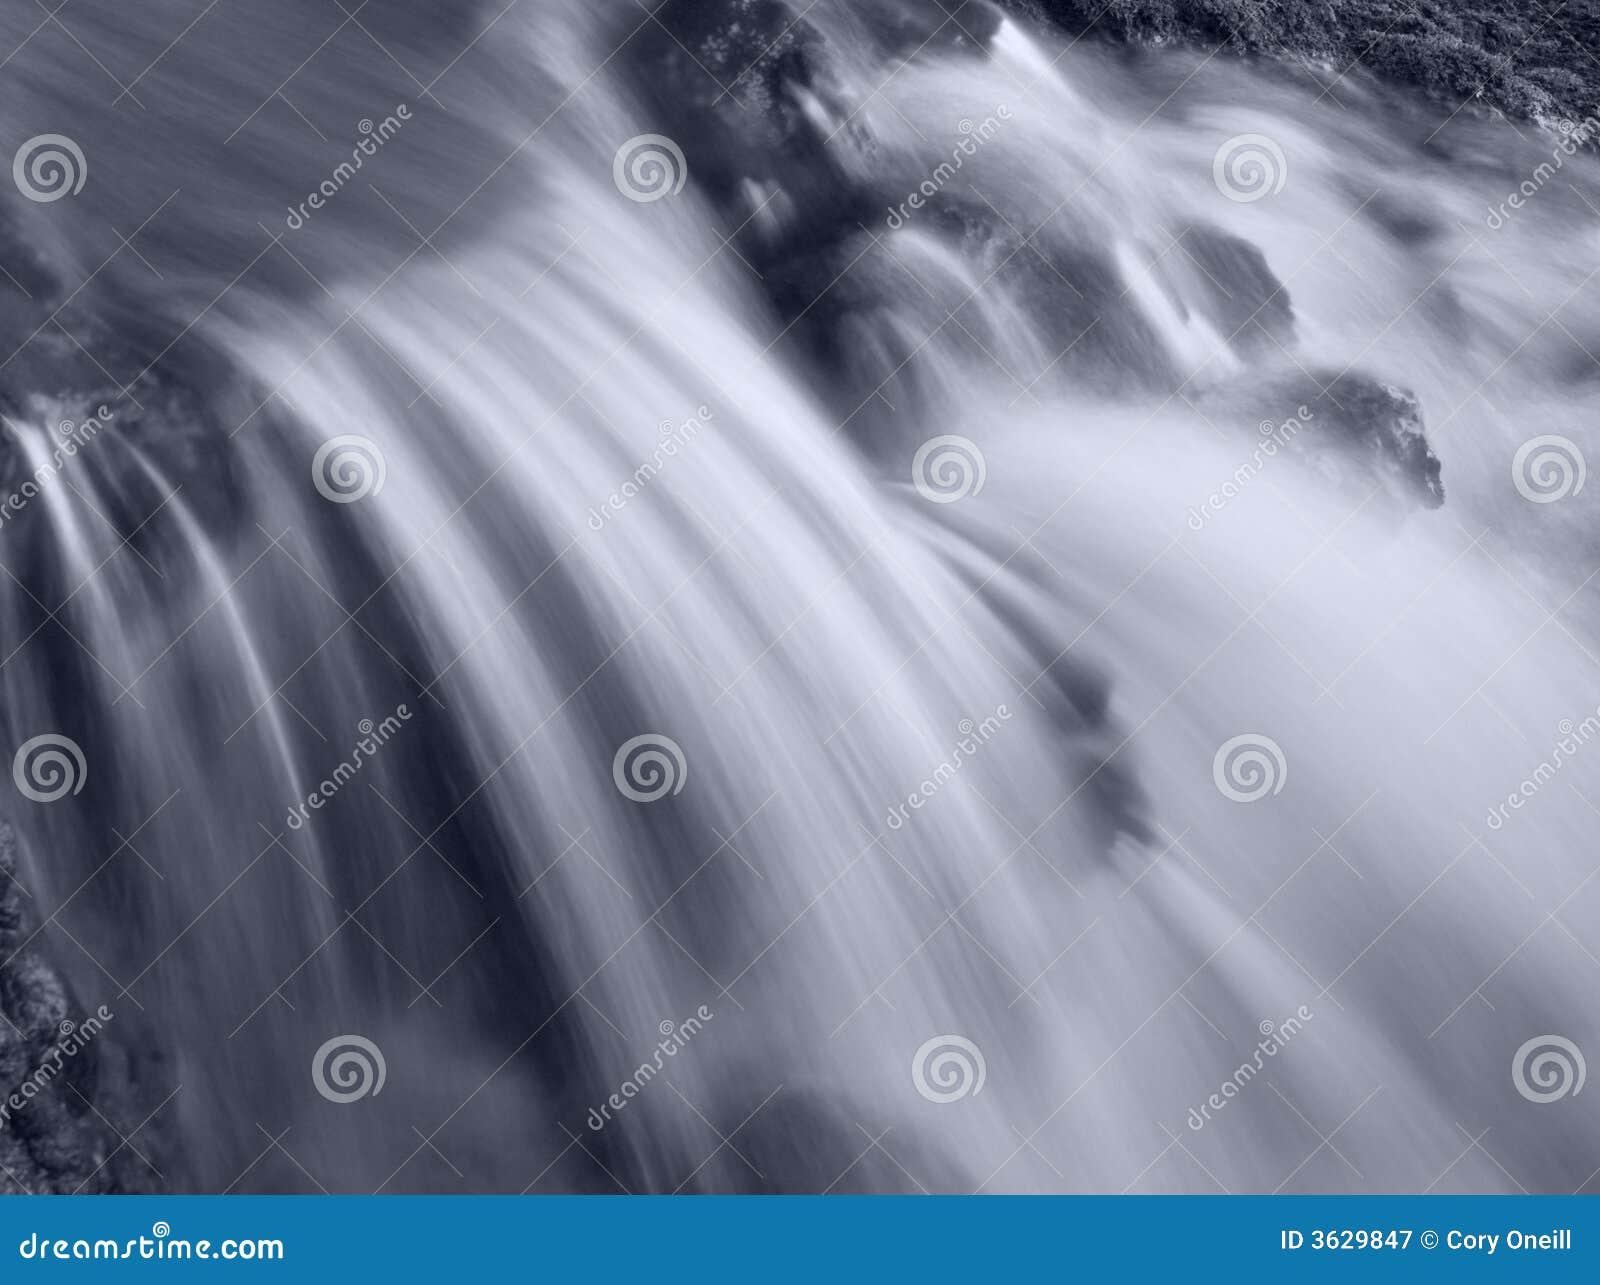 Spokojne wody